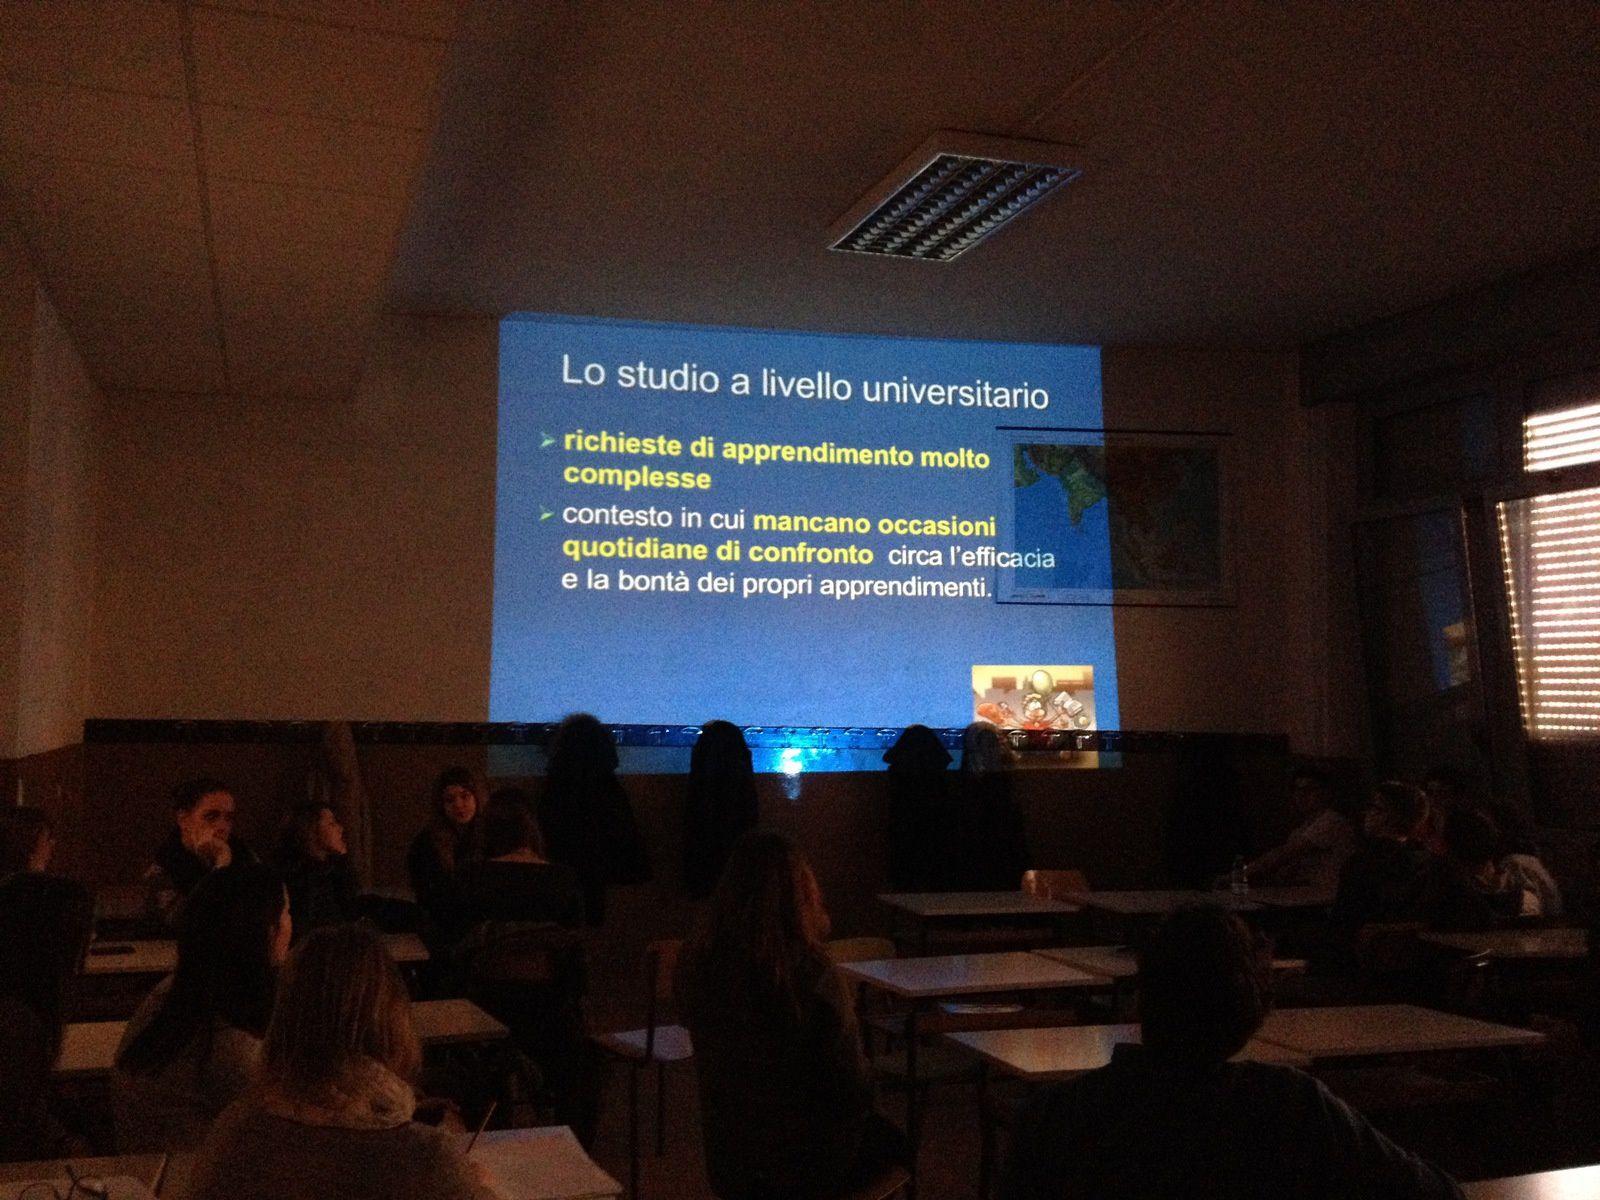 La Settimana dello Studente 2015 /.../ Students' Week 2015 /.../ La 'Semaine des élèves' 2015